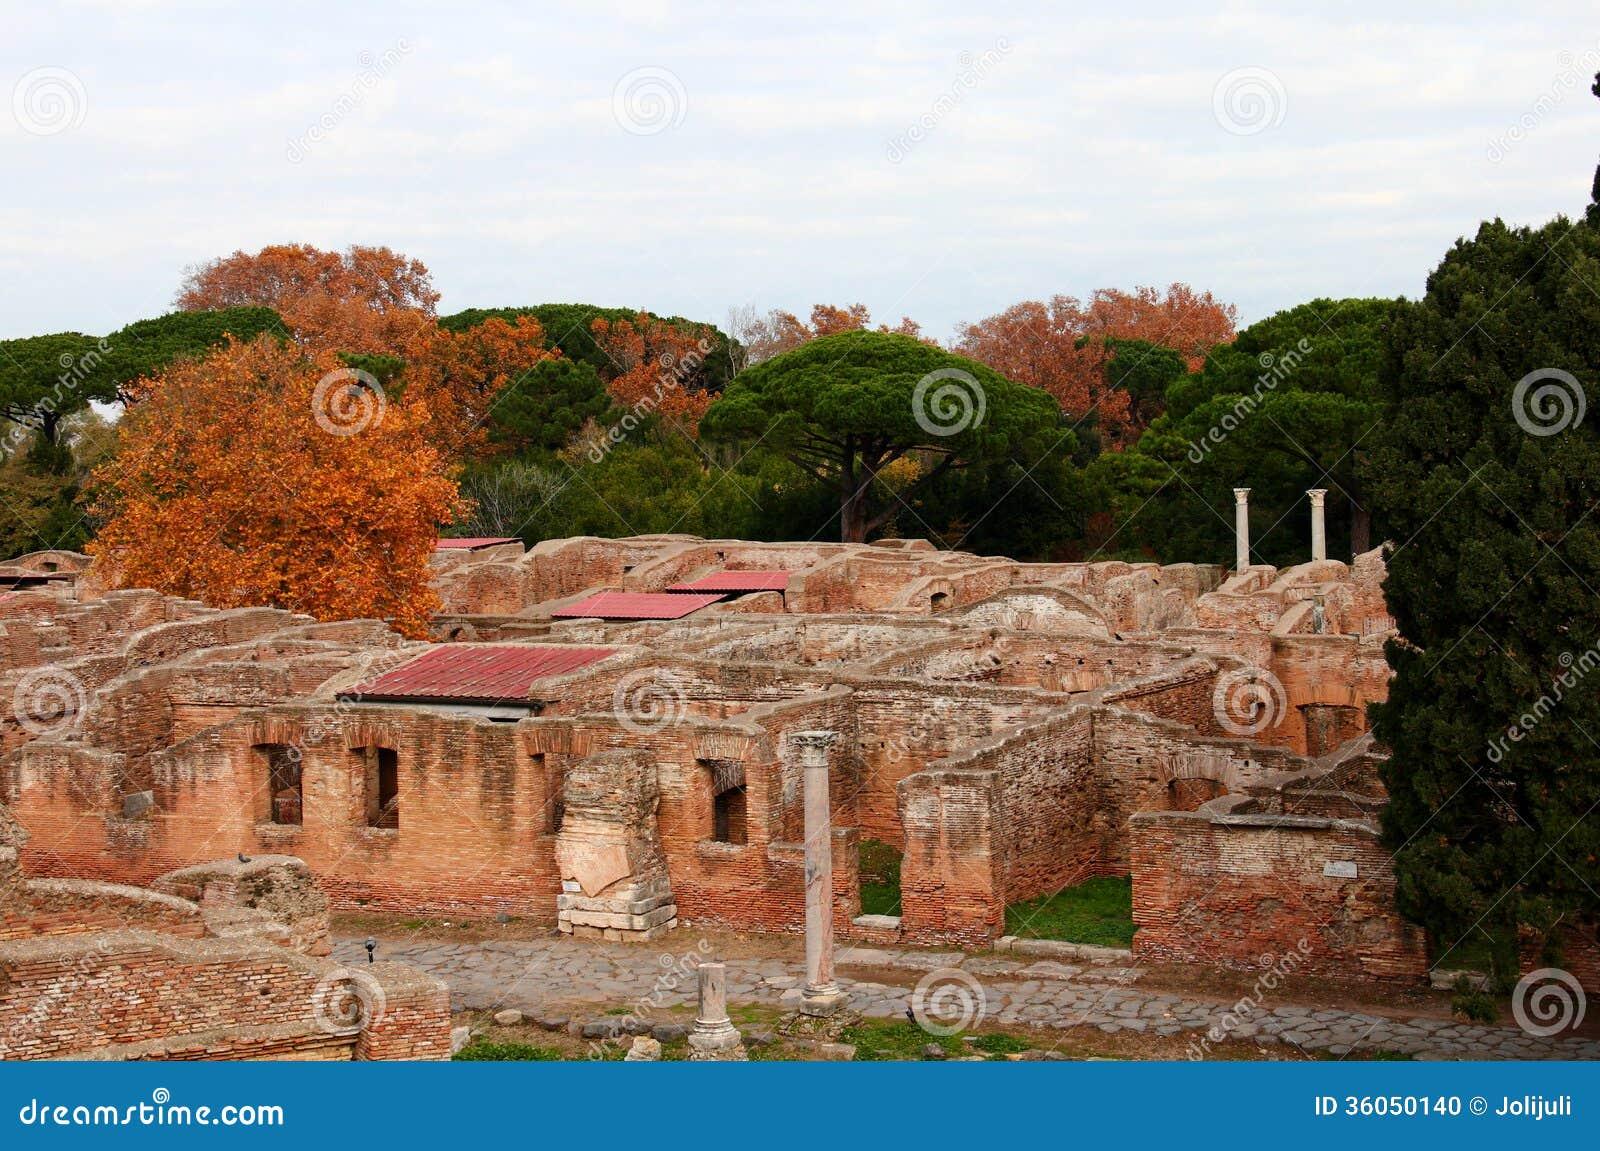 Ostia antica ruins stock photo image 36050140 for Mr arredamenti ostia antica